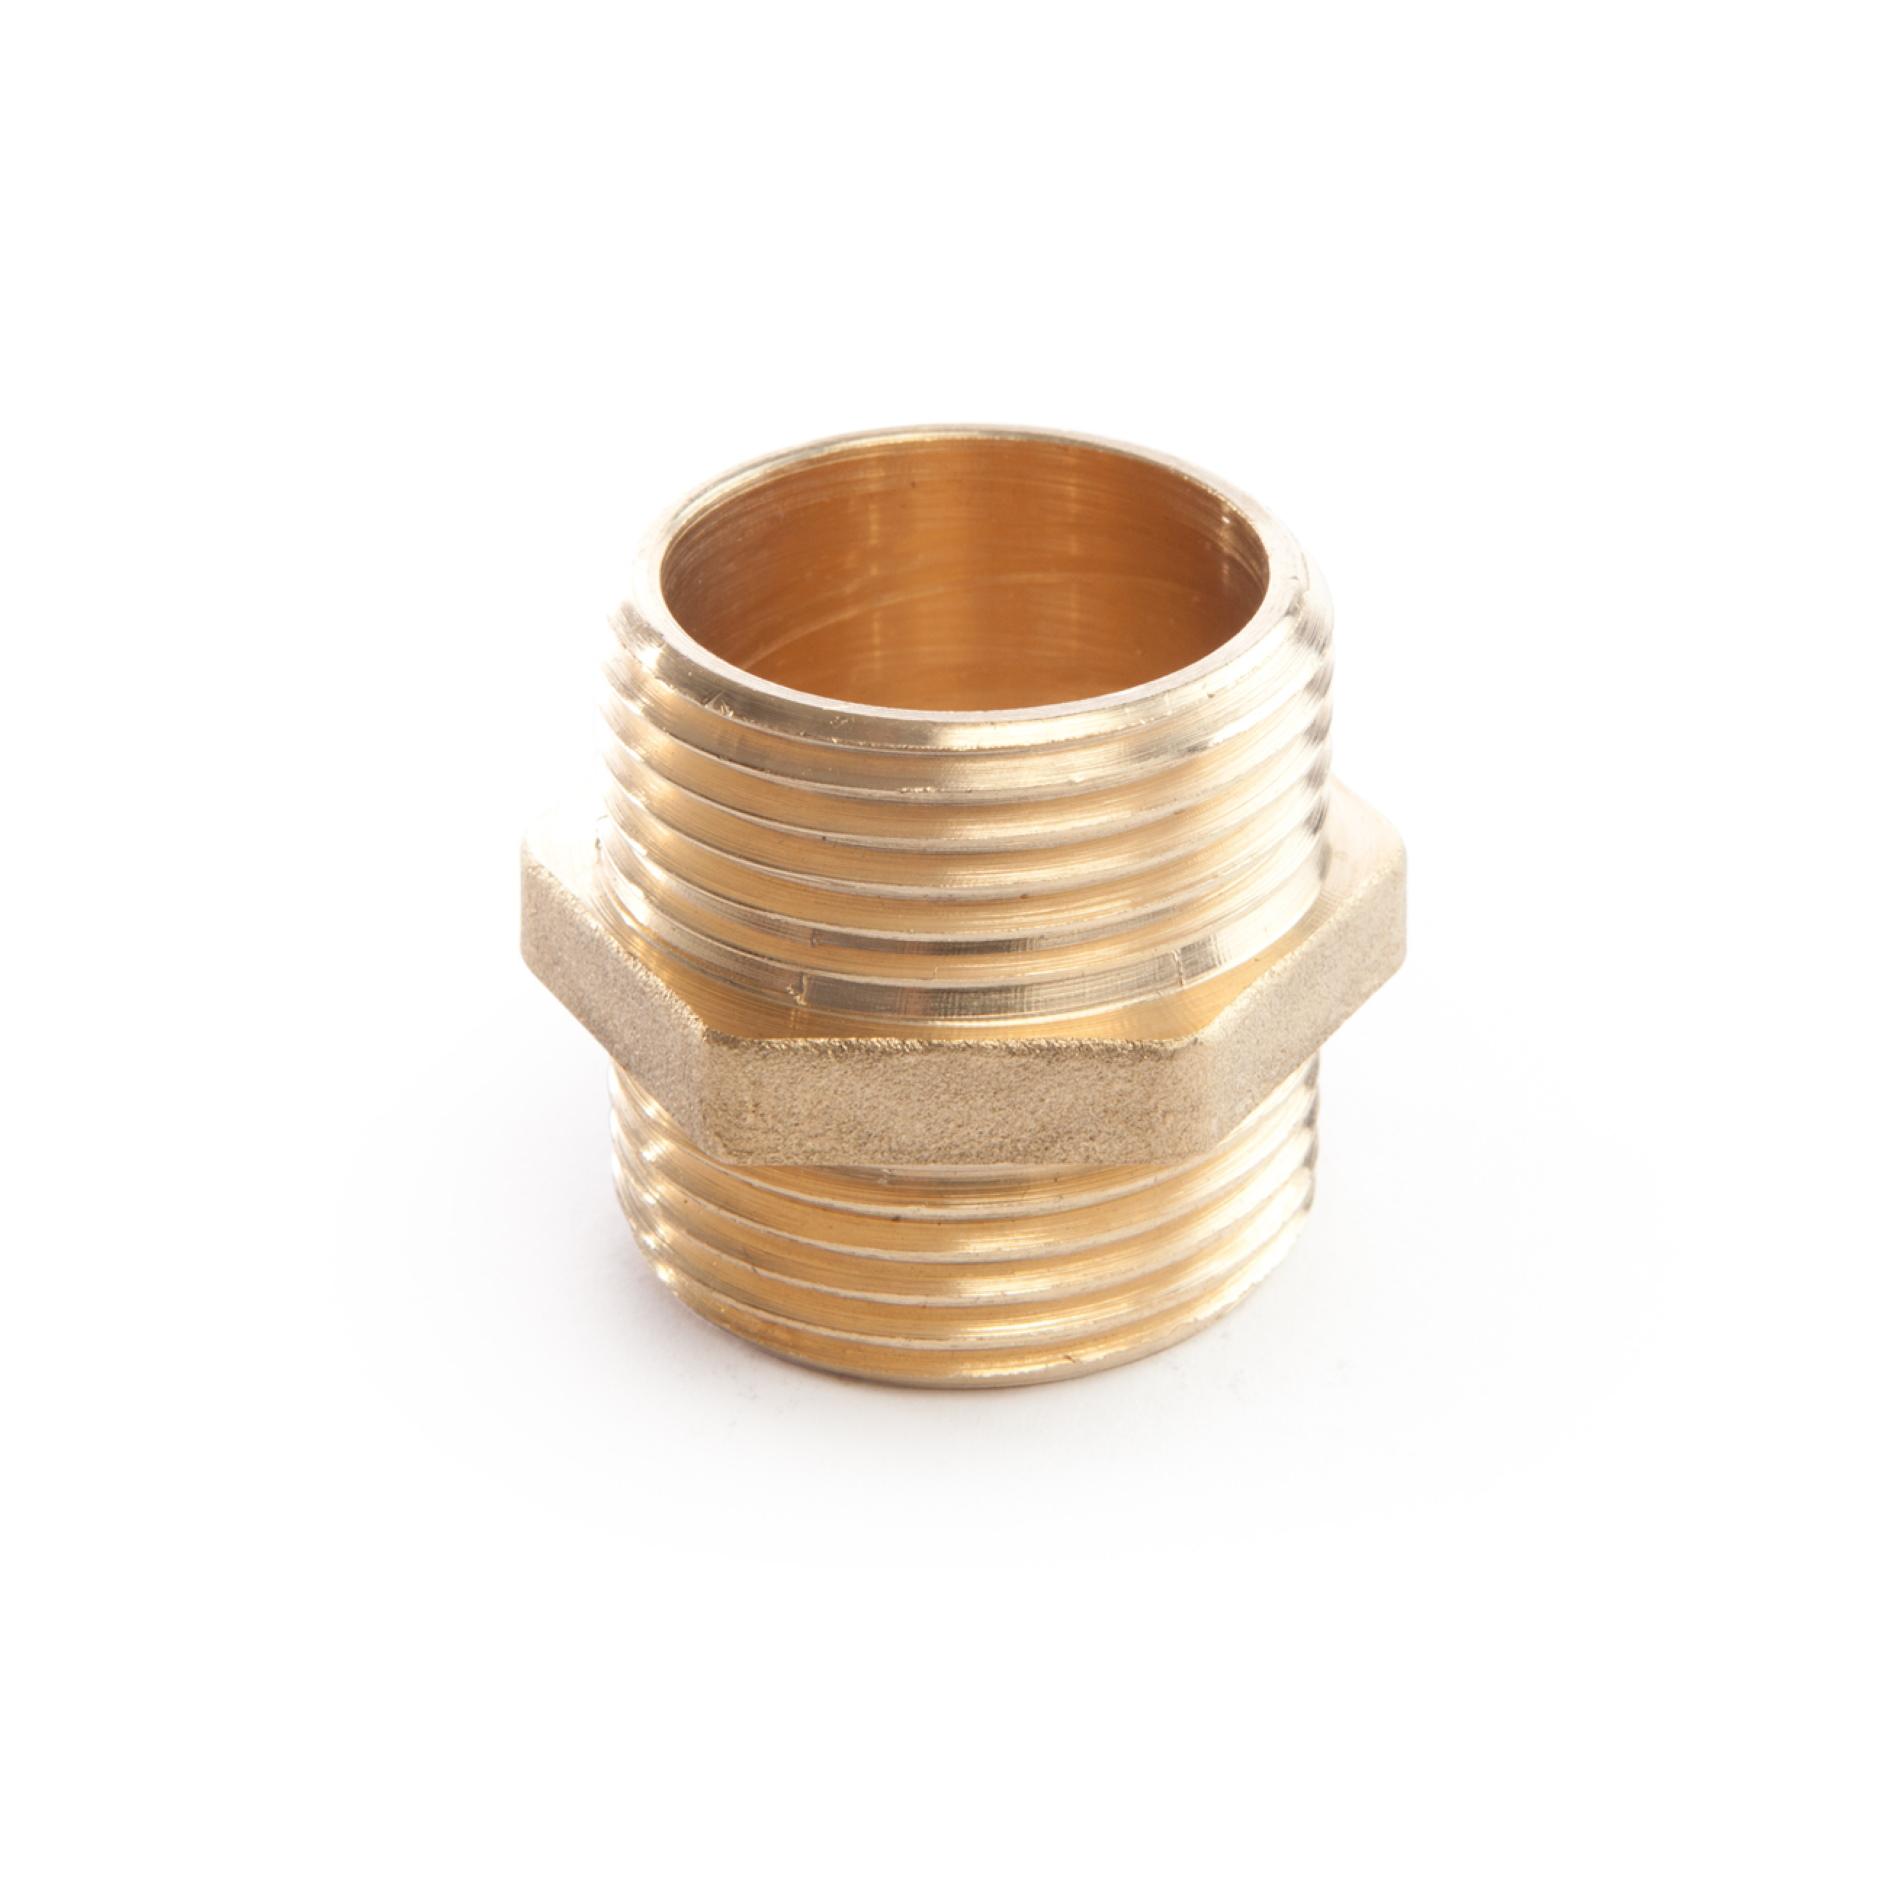 972 Nipplo doppio MxM double nipple brass threaded filettato ottone